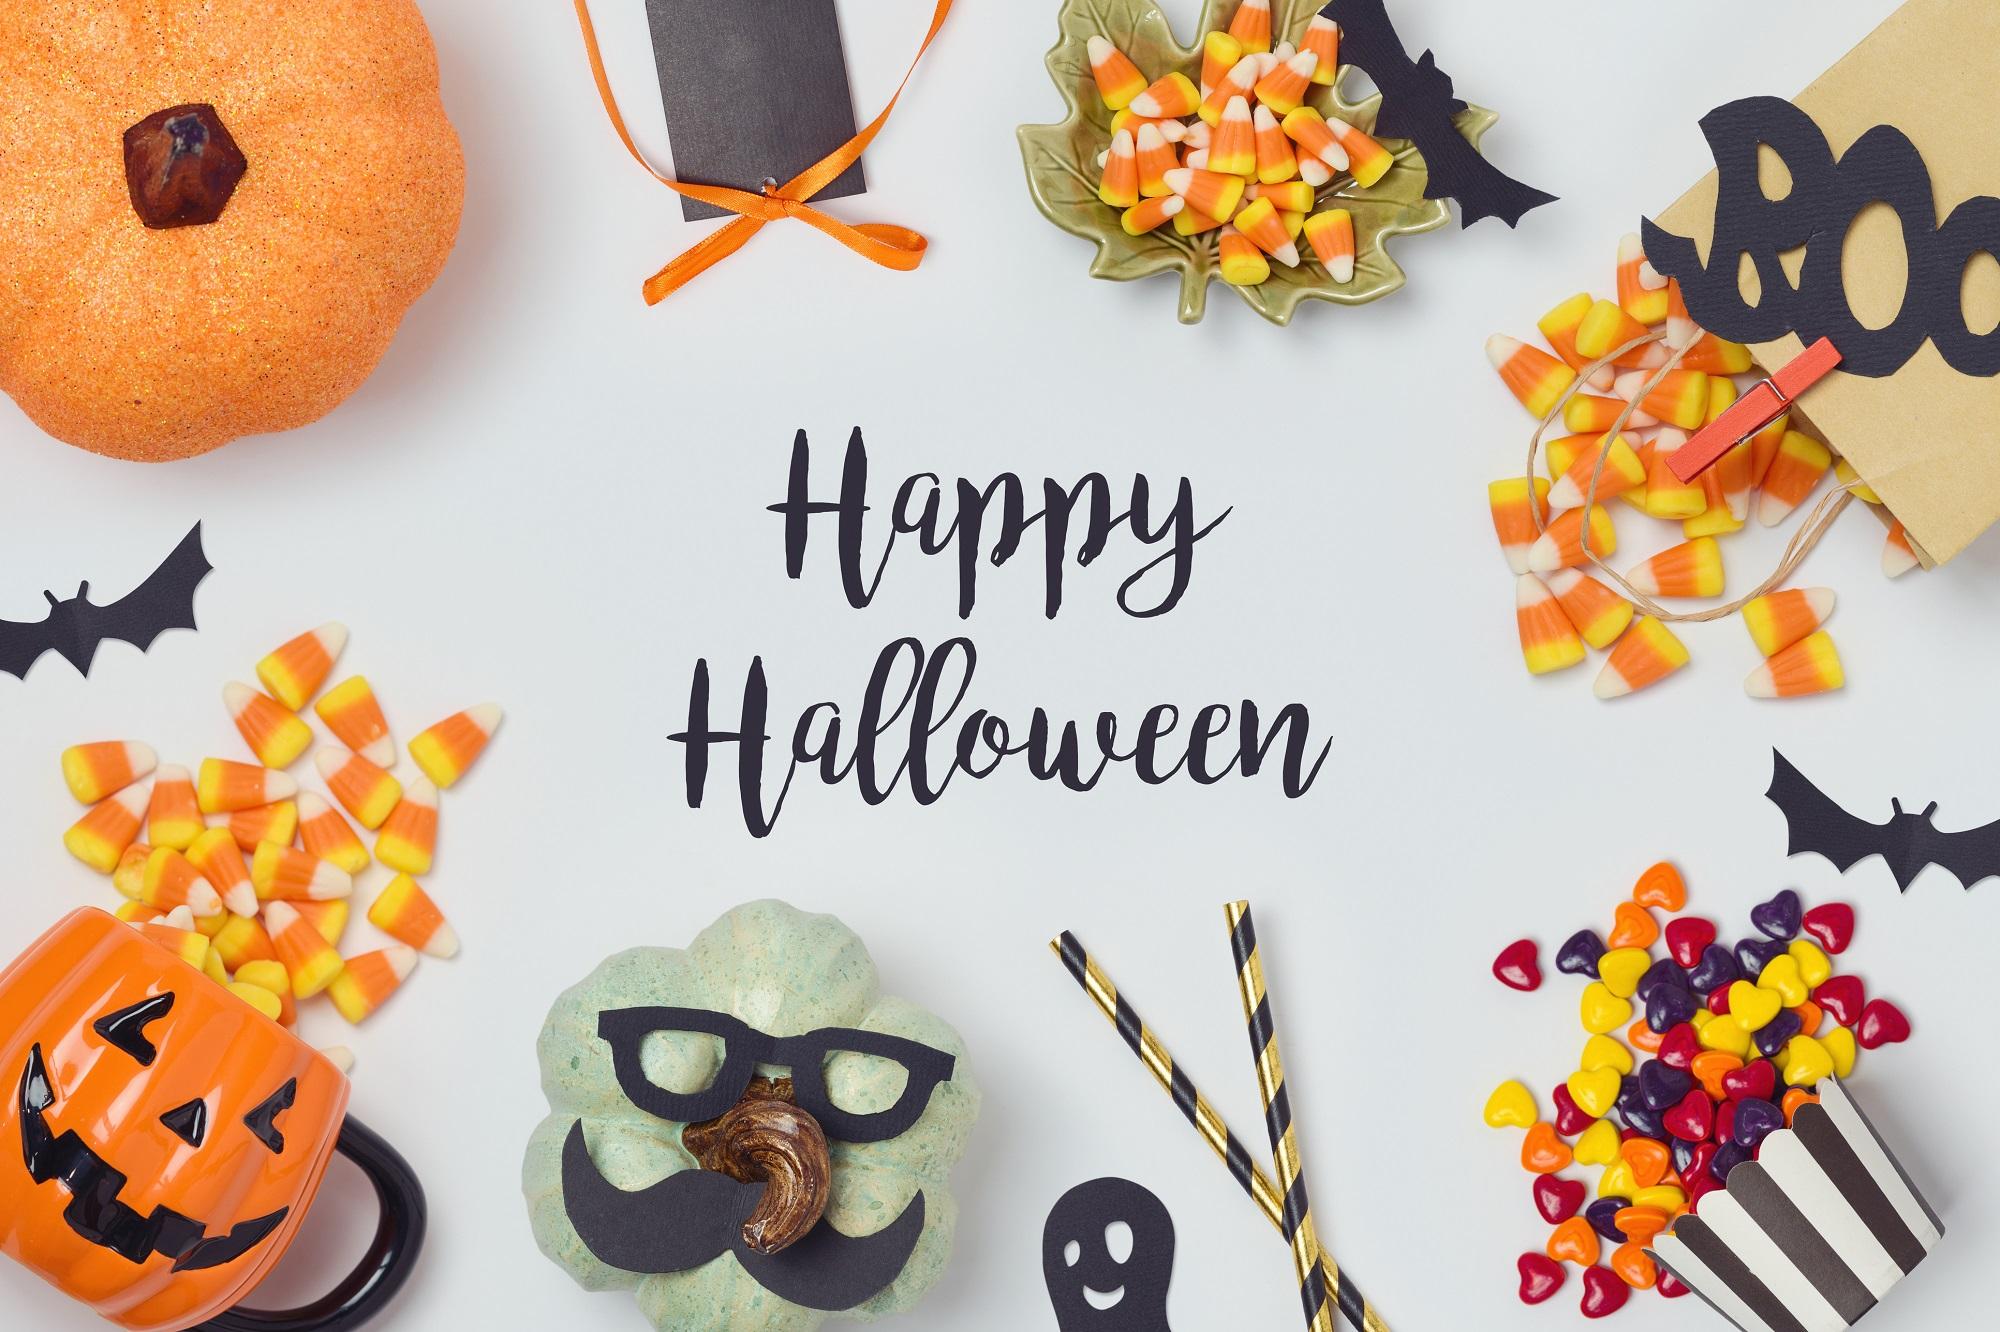 Halloween holiday marketing consumer data